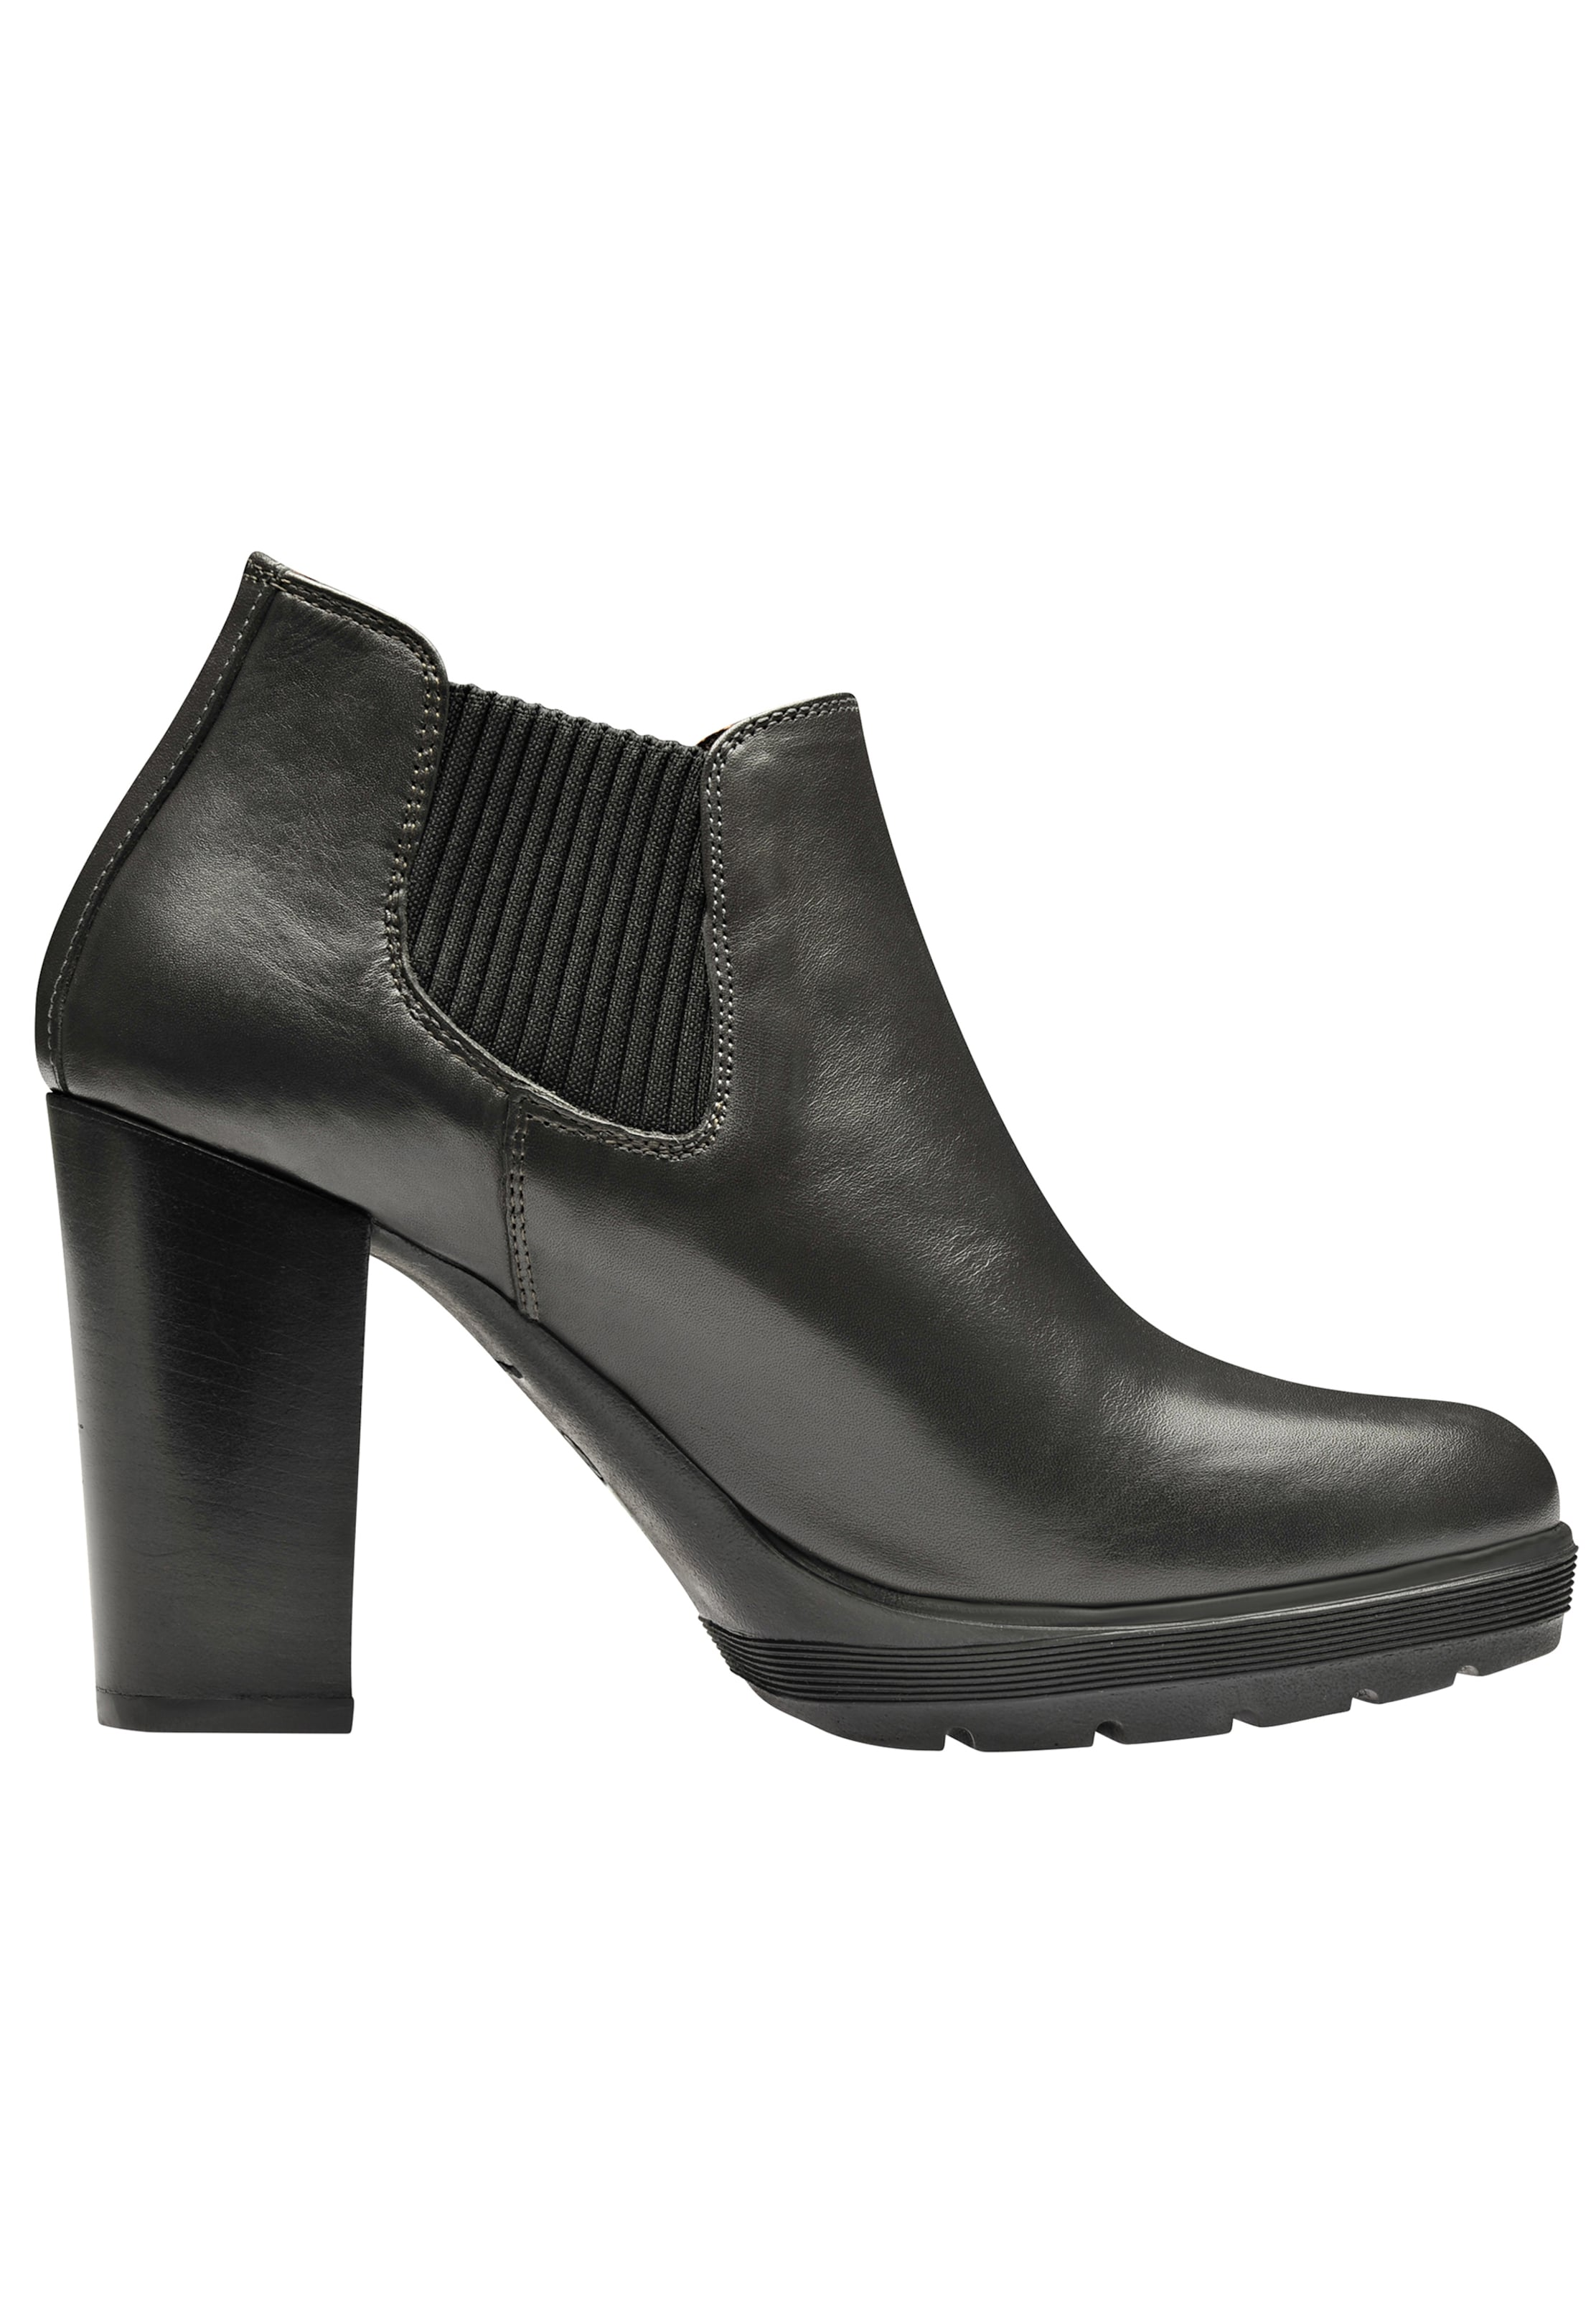 En Gris Evita Foncé Boots Chelsea MGzpqSVU